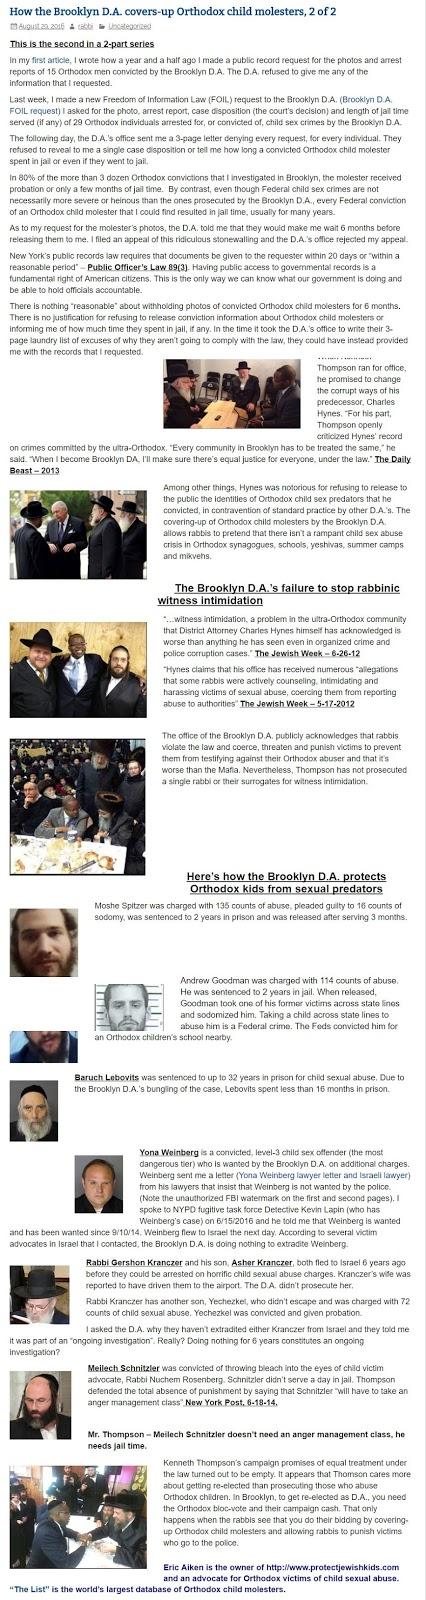 http://protectjewishkids.com/?p=2623